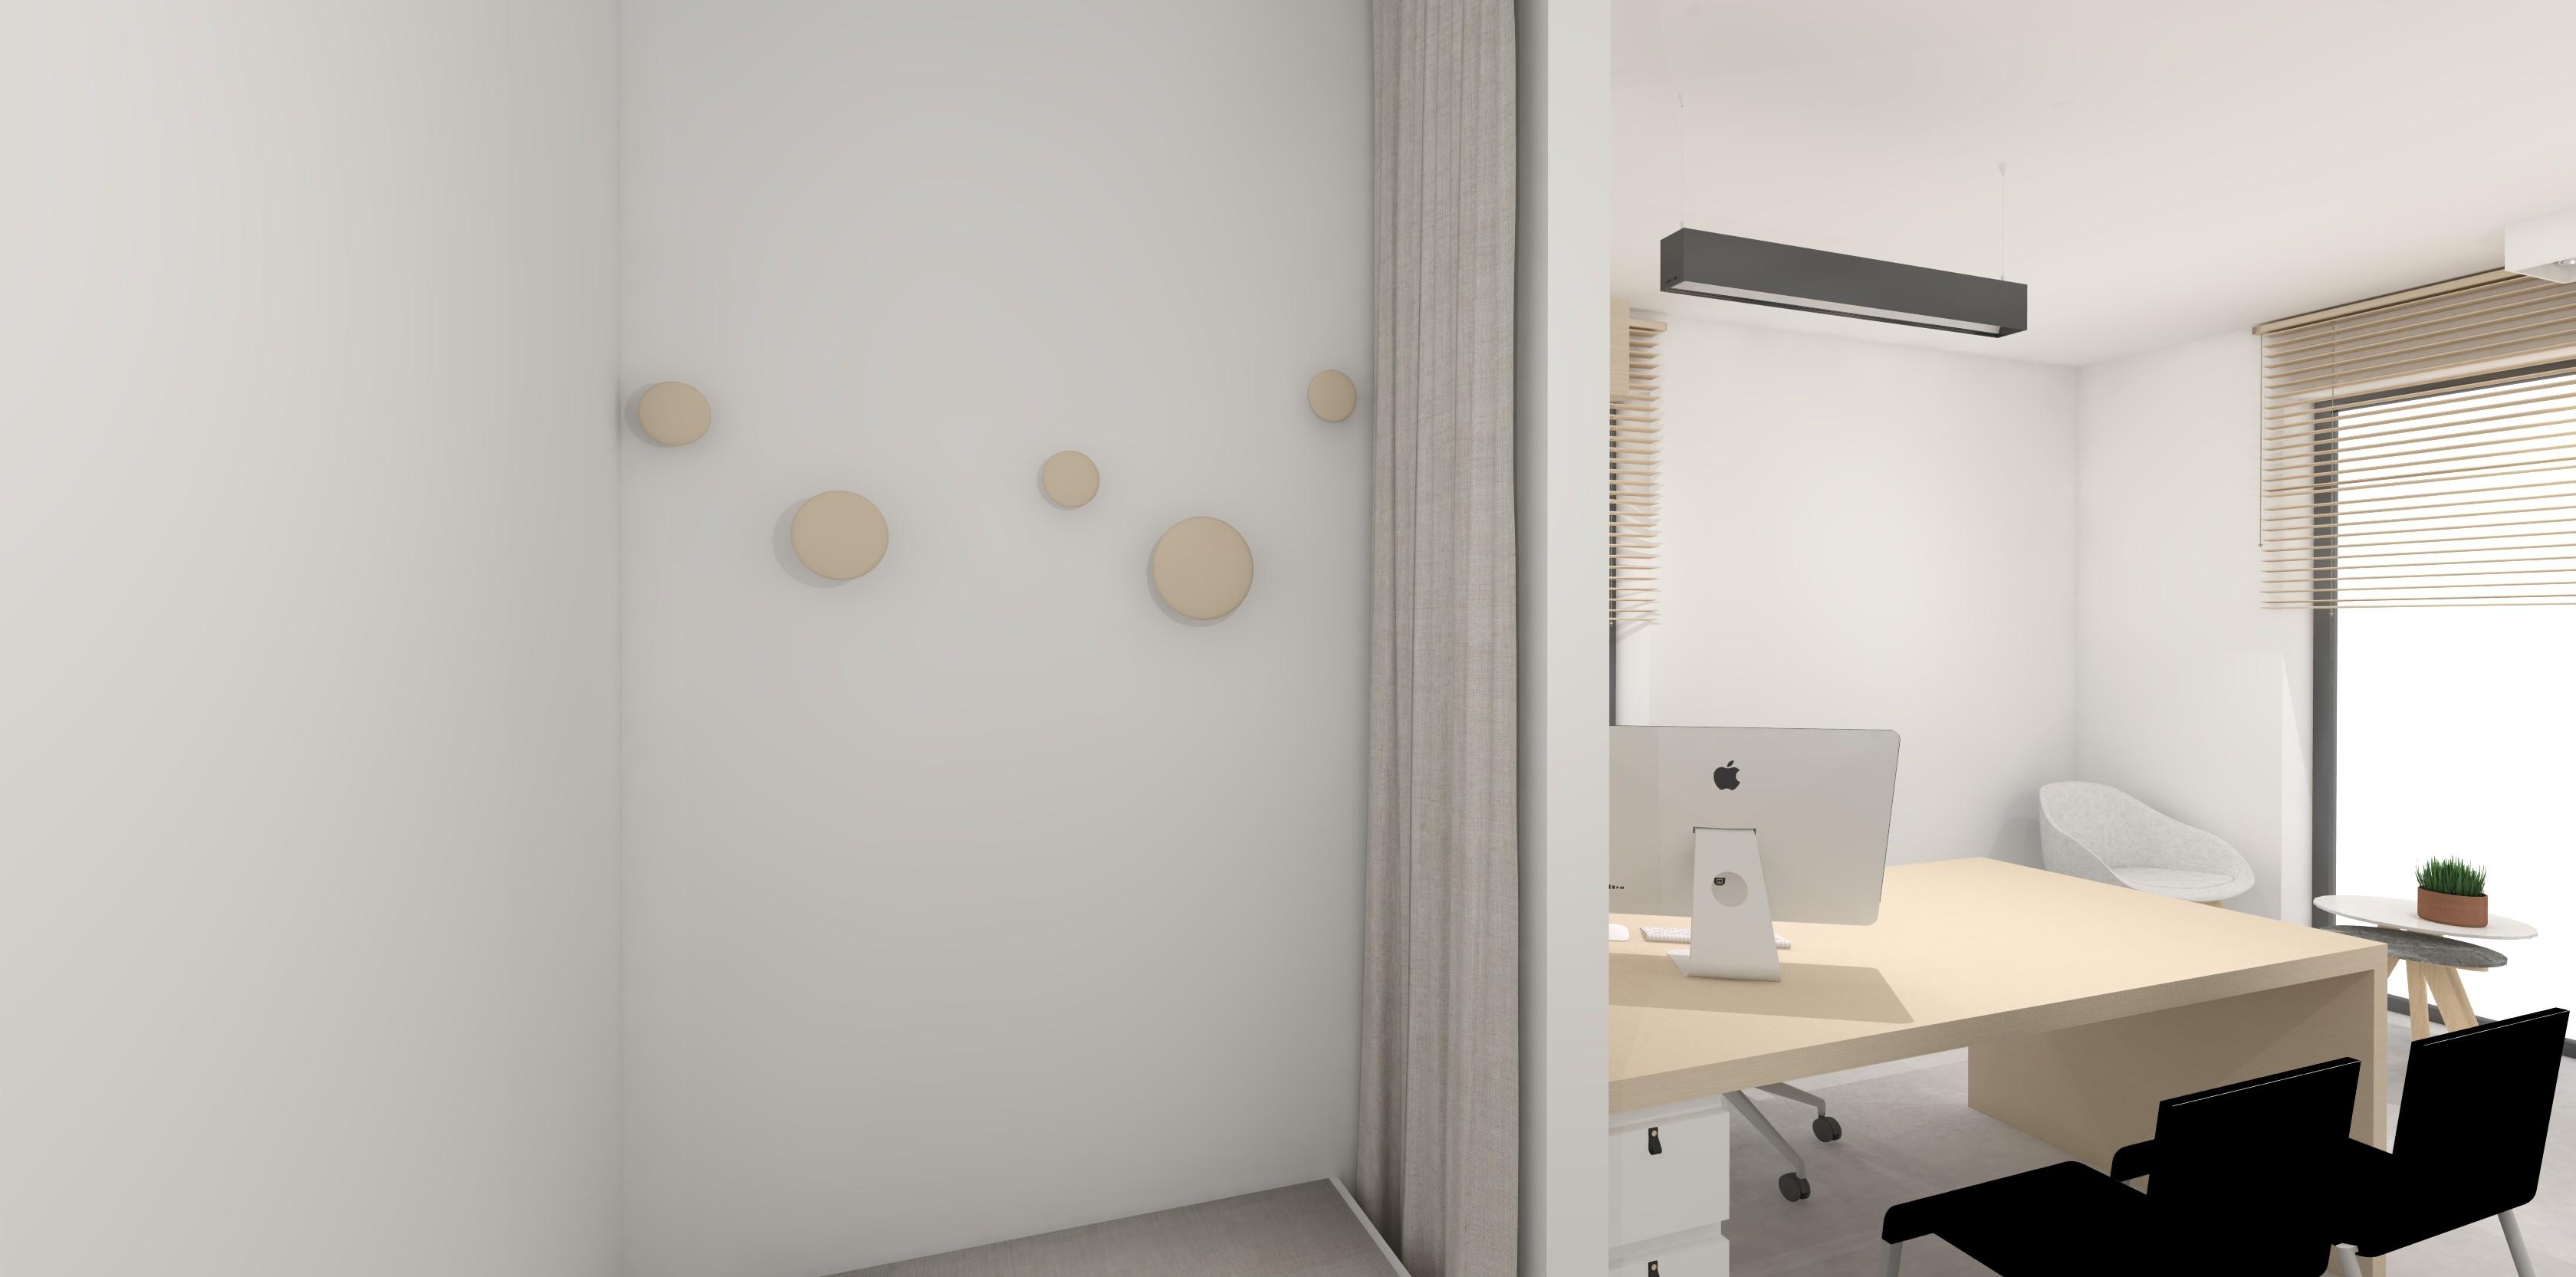 interieurarchitectuur nieuwbouw praktijk diëtiste